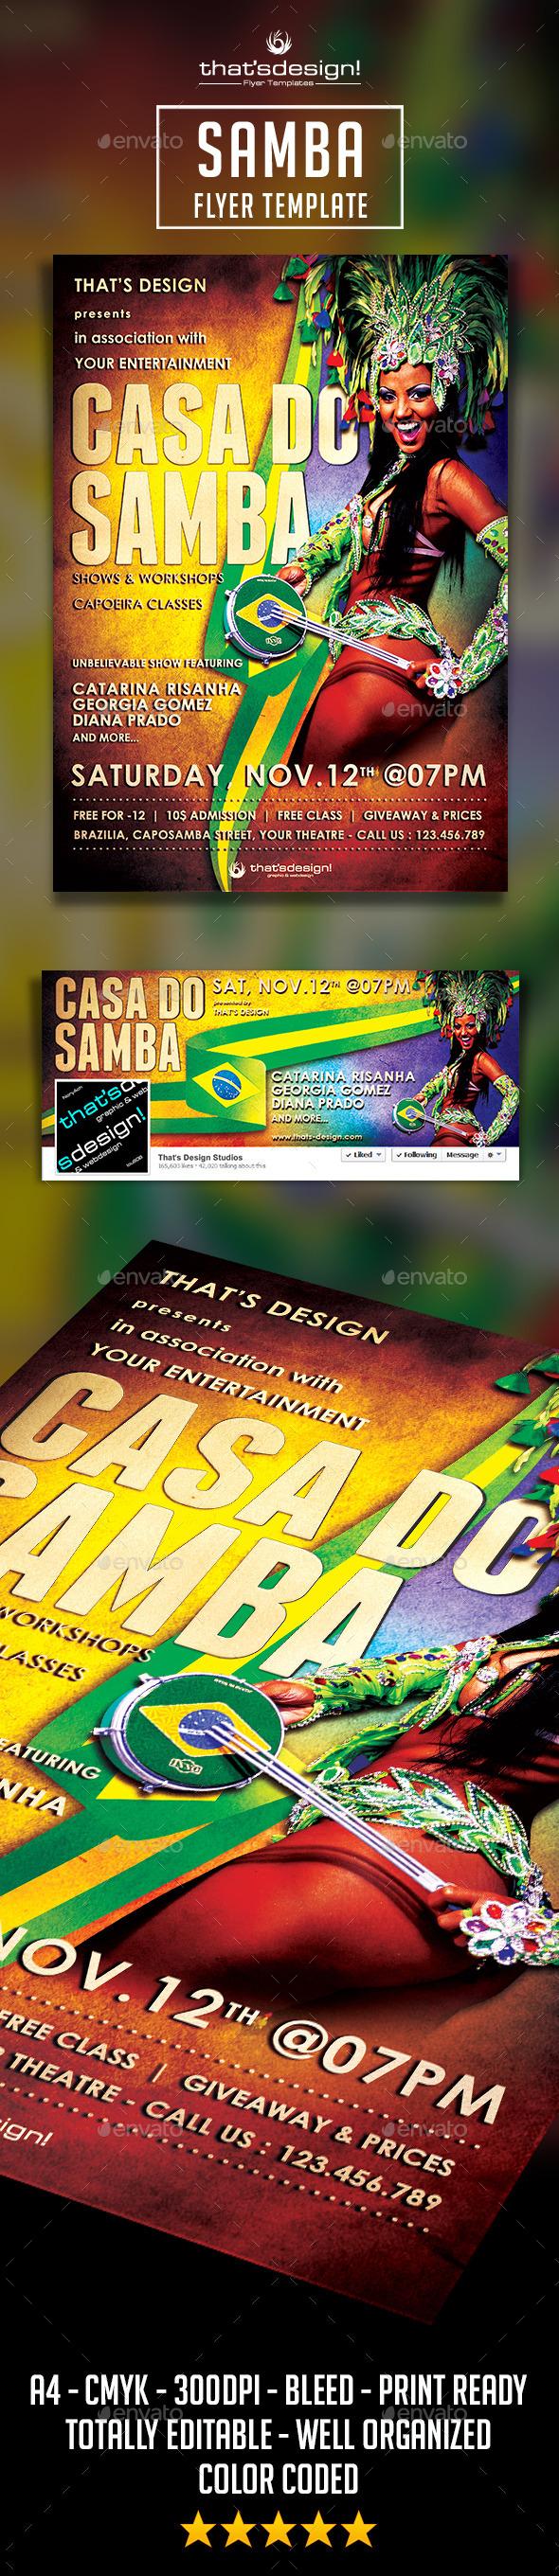 Samba Flyer Template